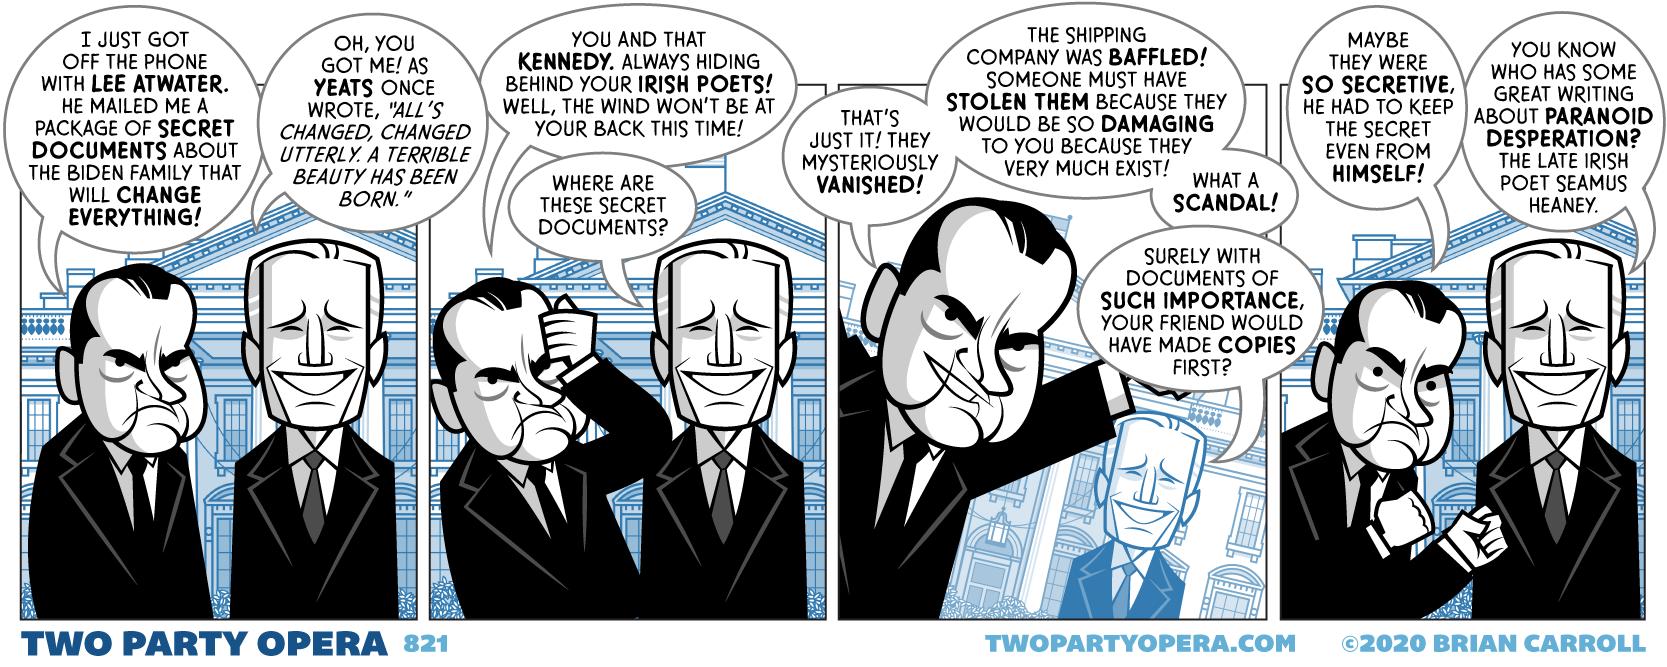 Totally Real Secret Biden Documents